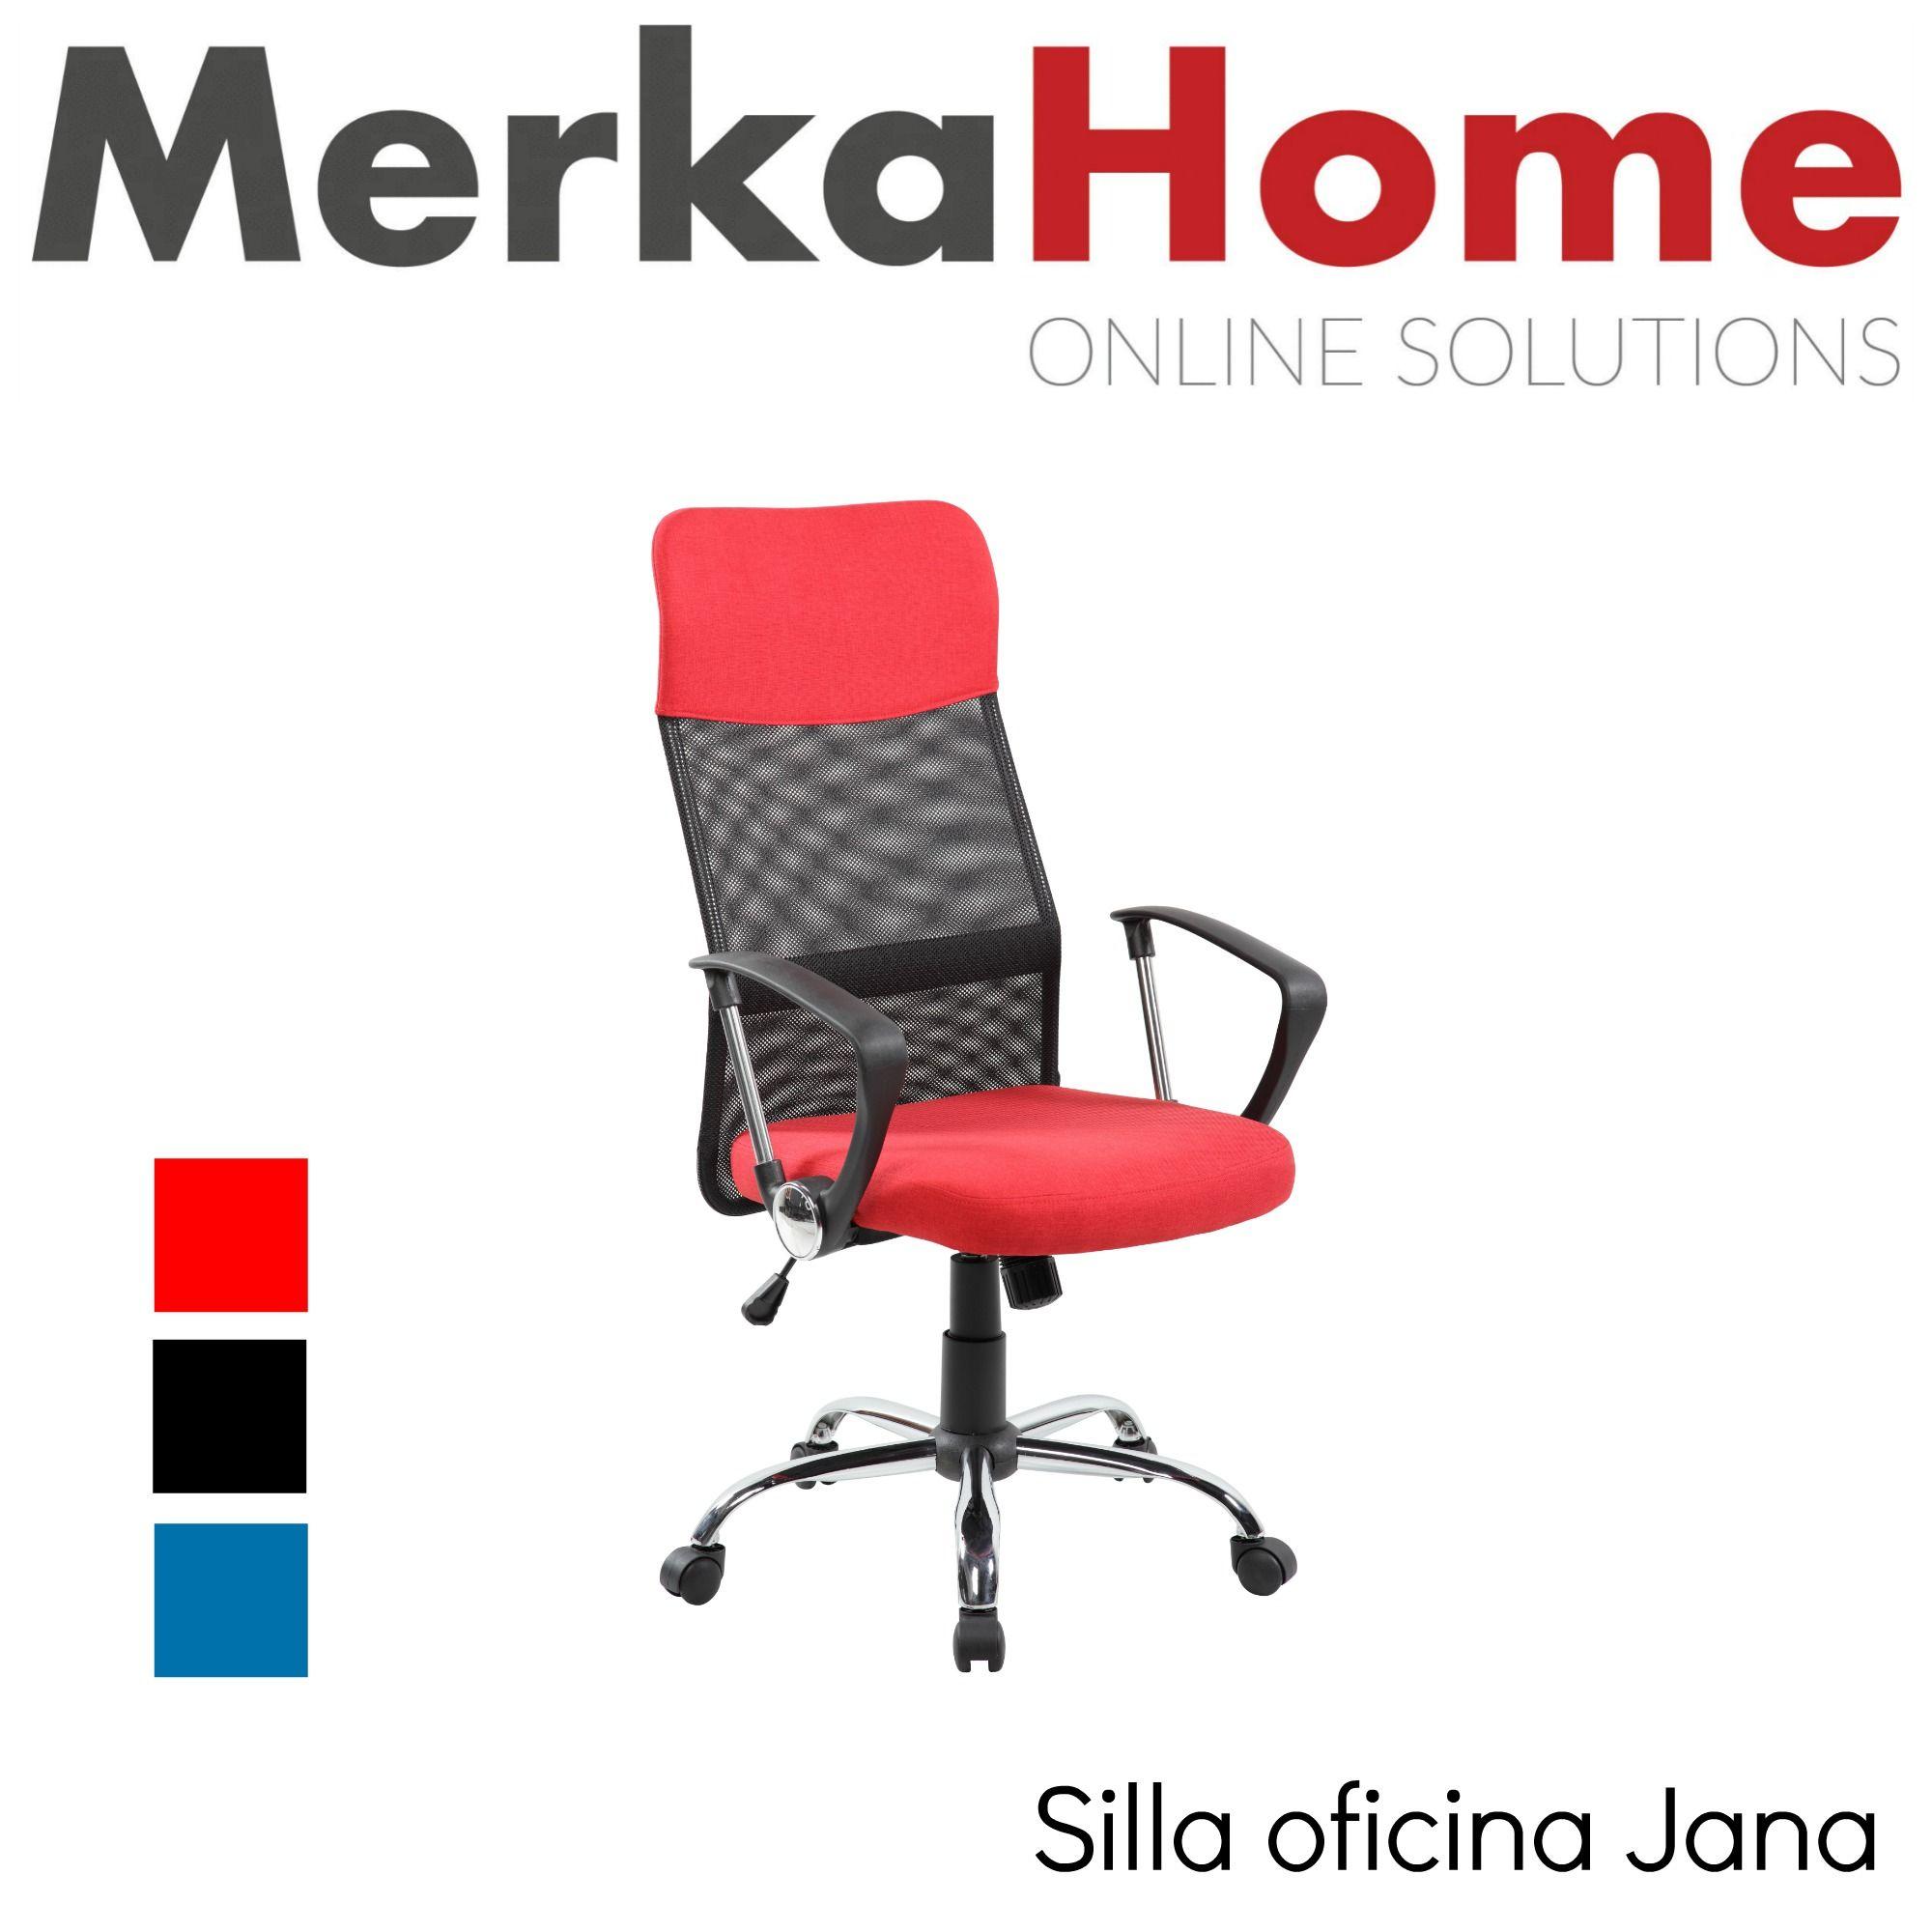 Silla De Oficina Ergonomica Jana Sillas De Oficina Oficinas Sillas